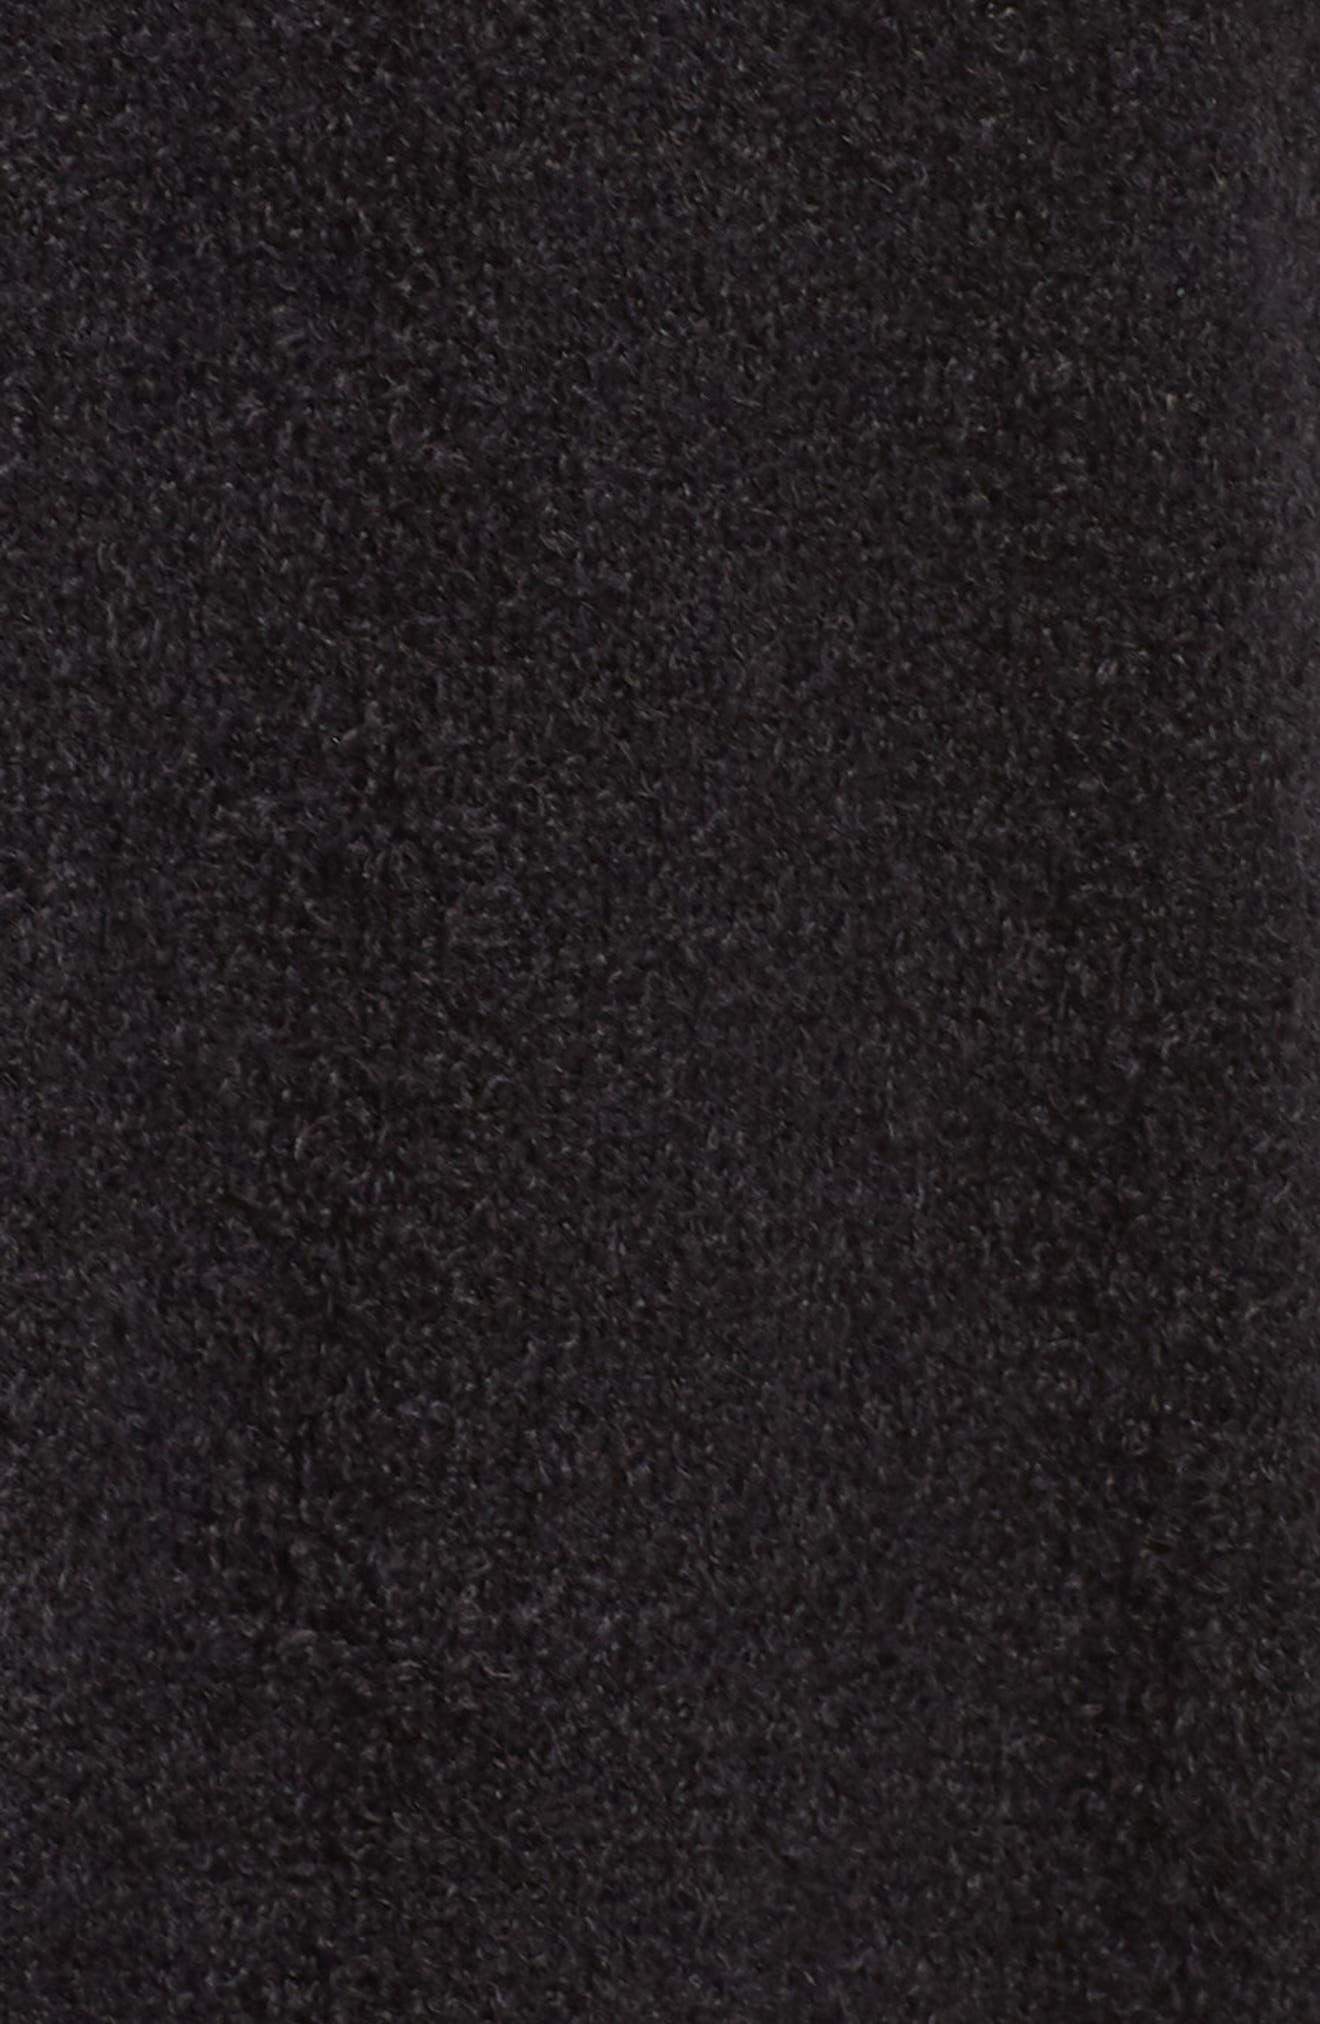 Off-Duty Plush Yarn Hoodie,                             Alternate thumbnail 5, color,                             BLACK